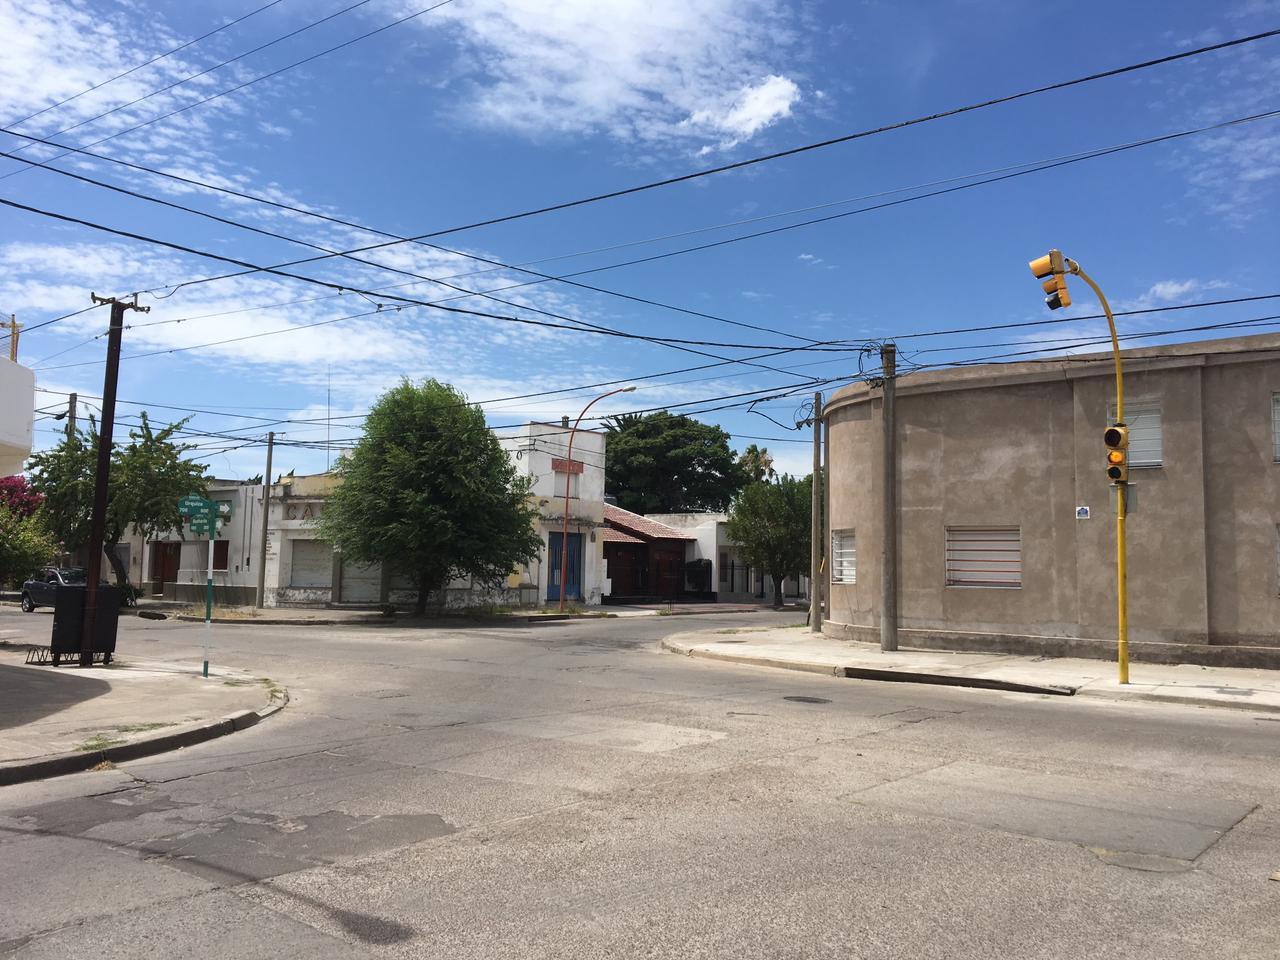 semáforo urquiza y buchardo (1)